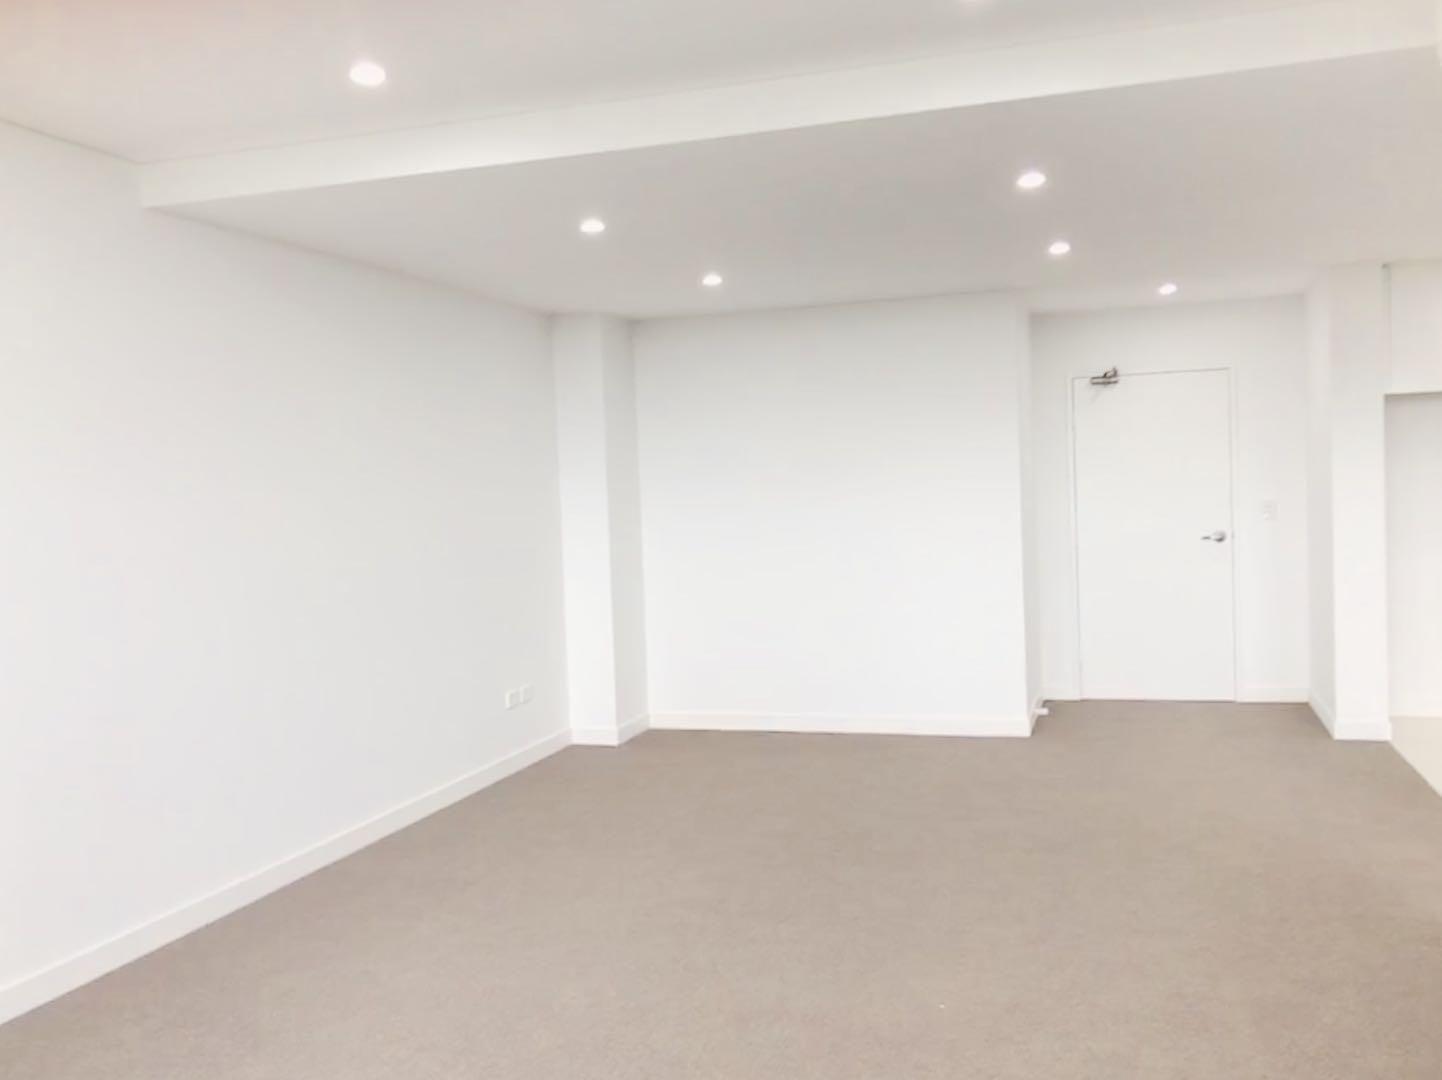 21/235 Homebush Rd, Strathfield NSW 2135, Image 2